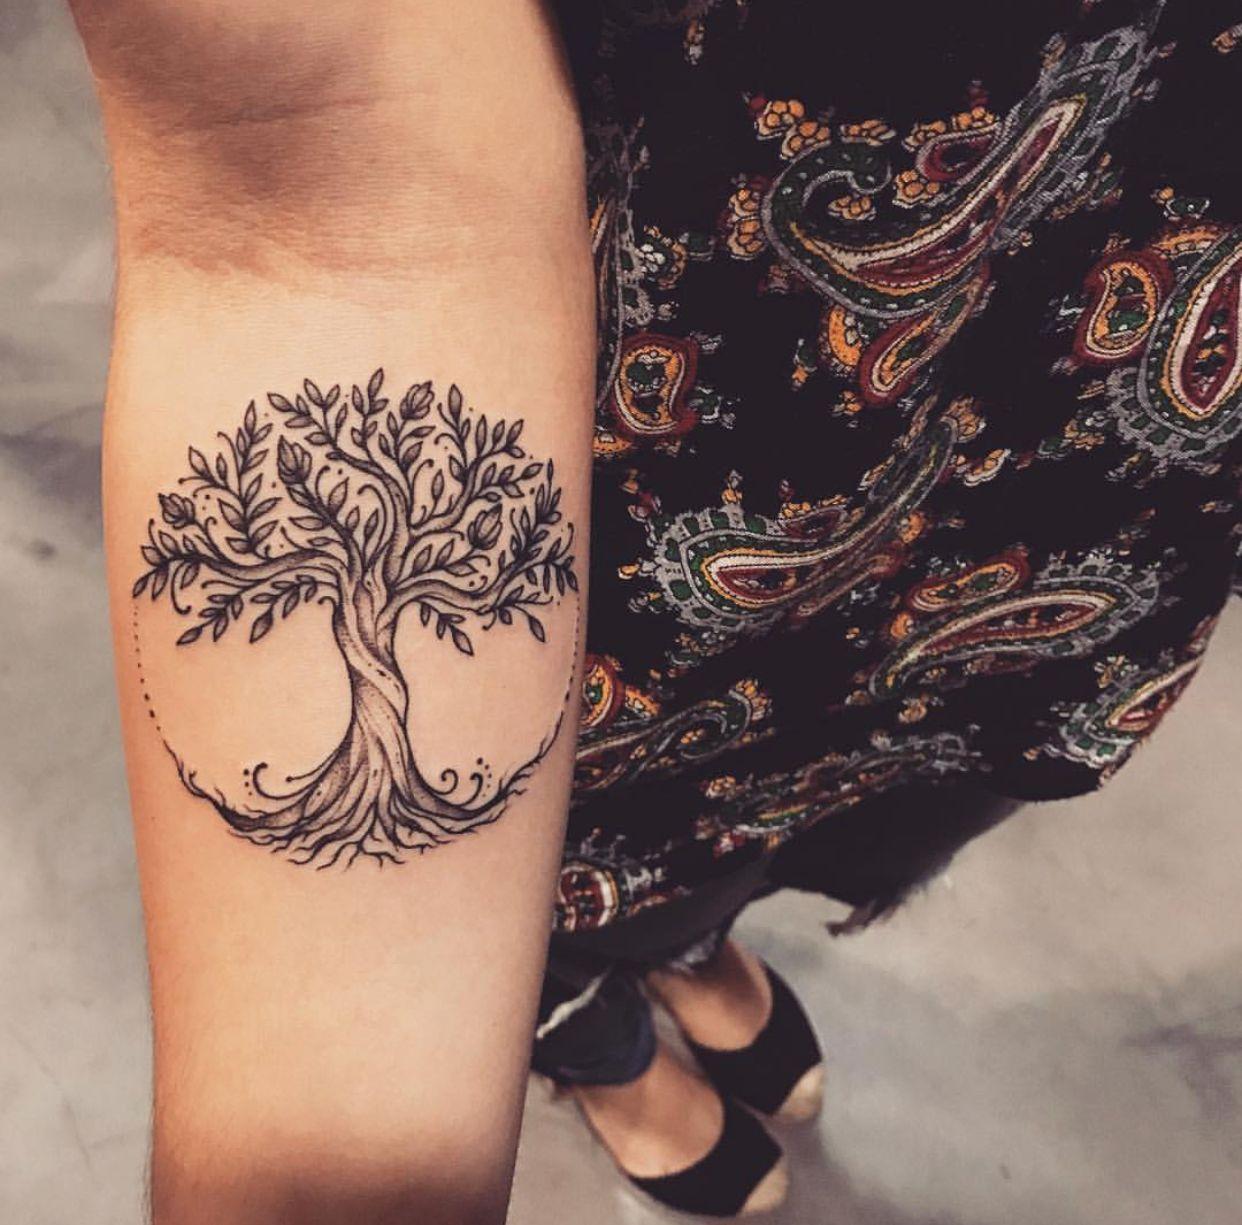 Pin by Cari Weaver on Tatuagens   Life tattoos, Tattoos, Body art ...